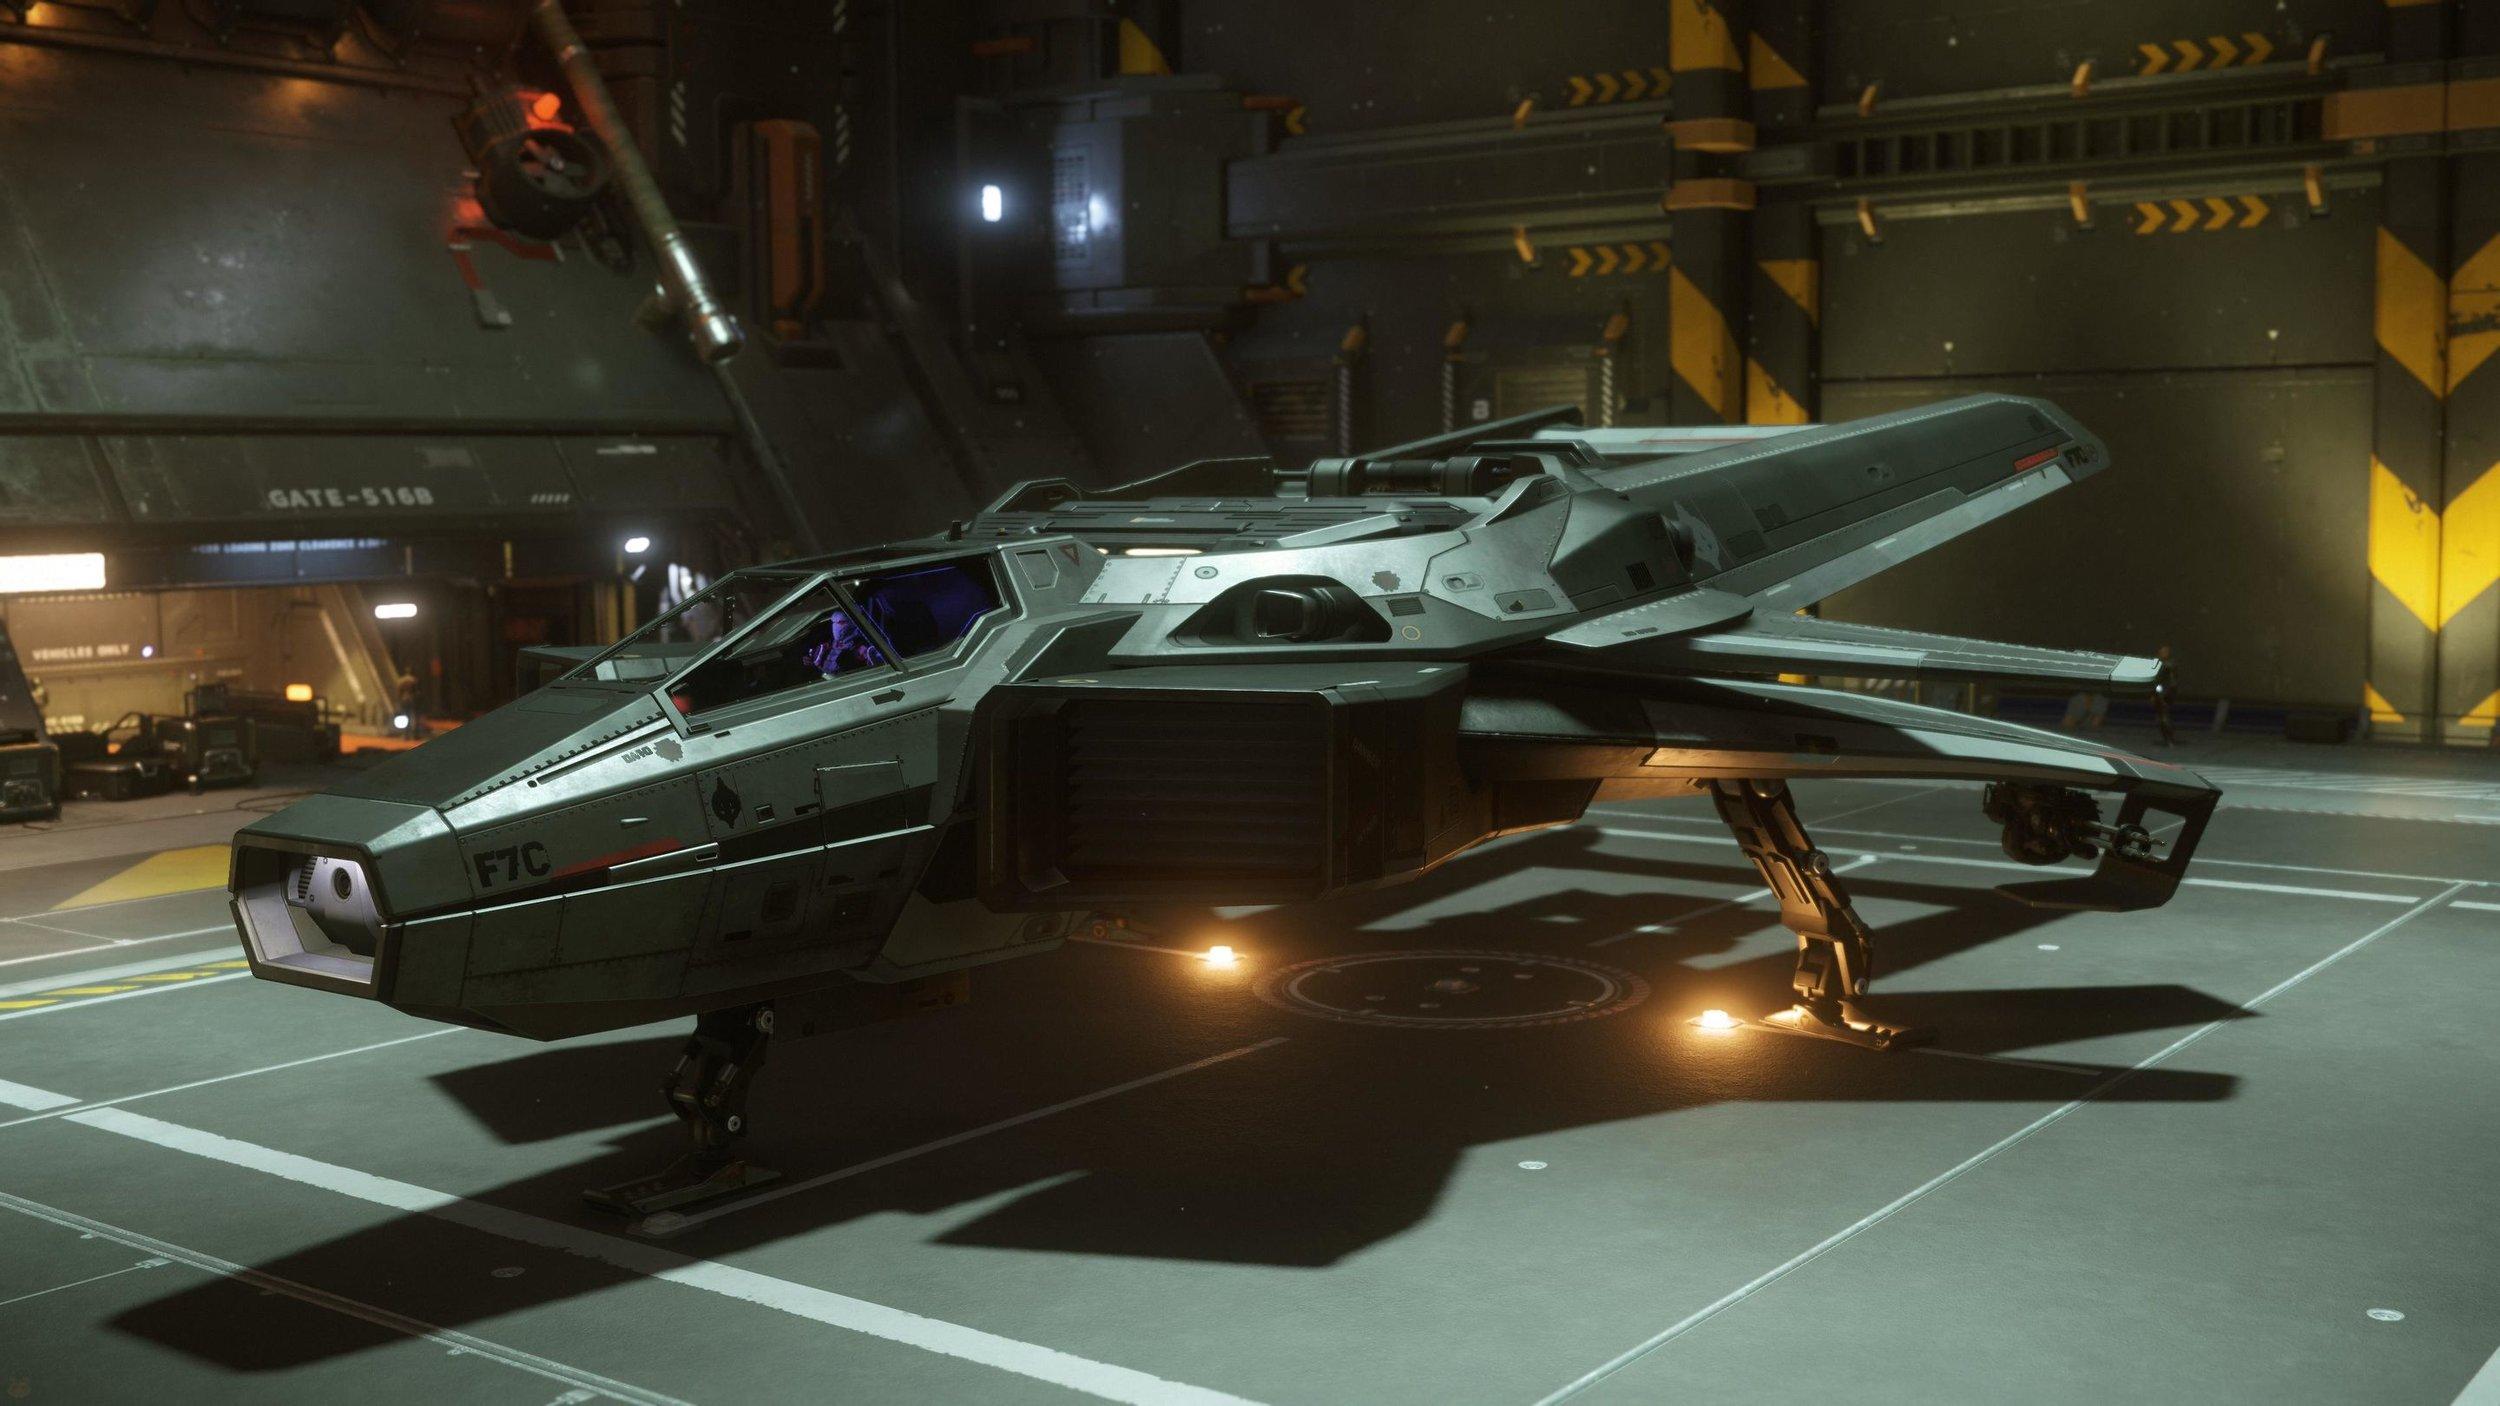 (F7C Hornet Photo Courtesy of Anvil Aerospace)